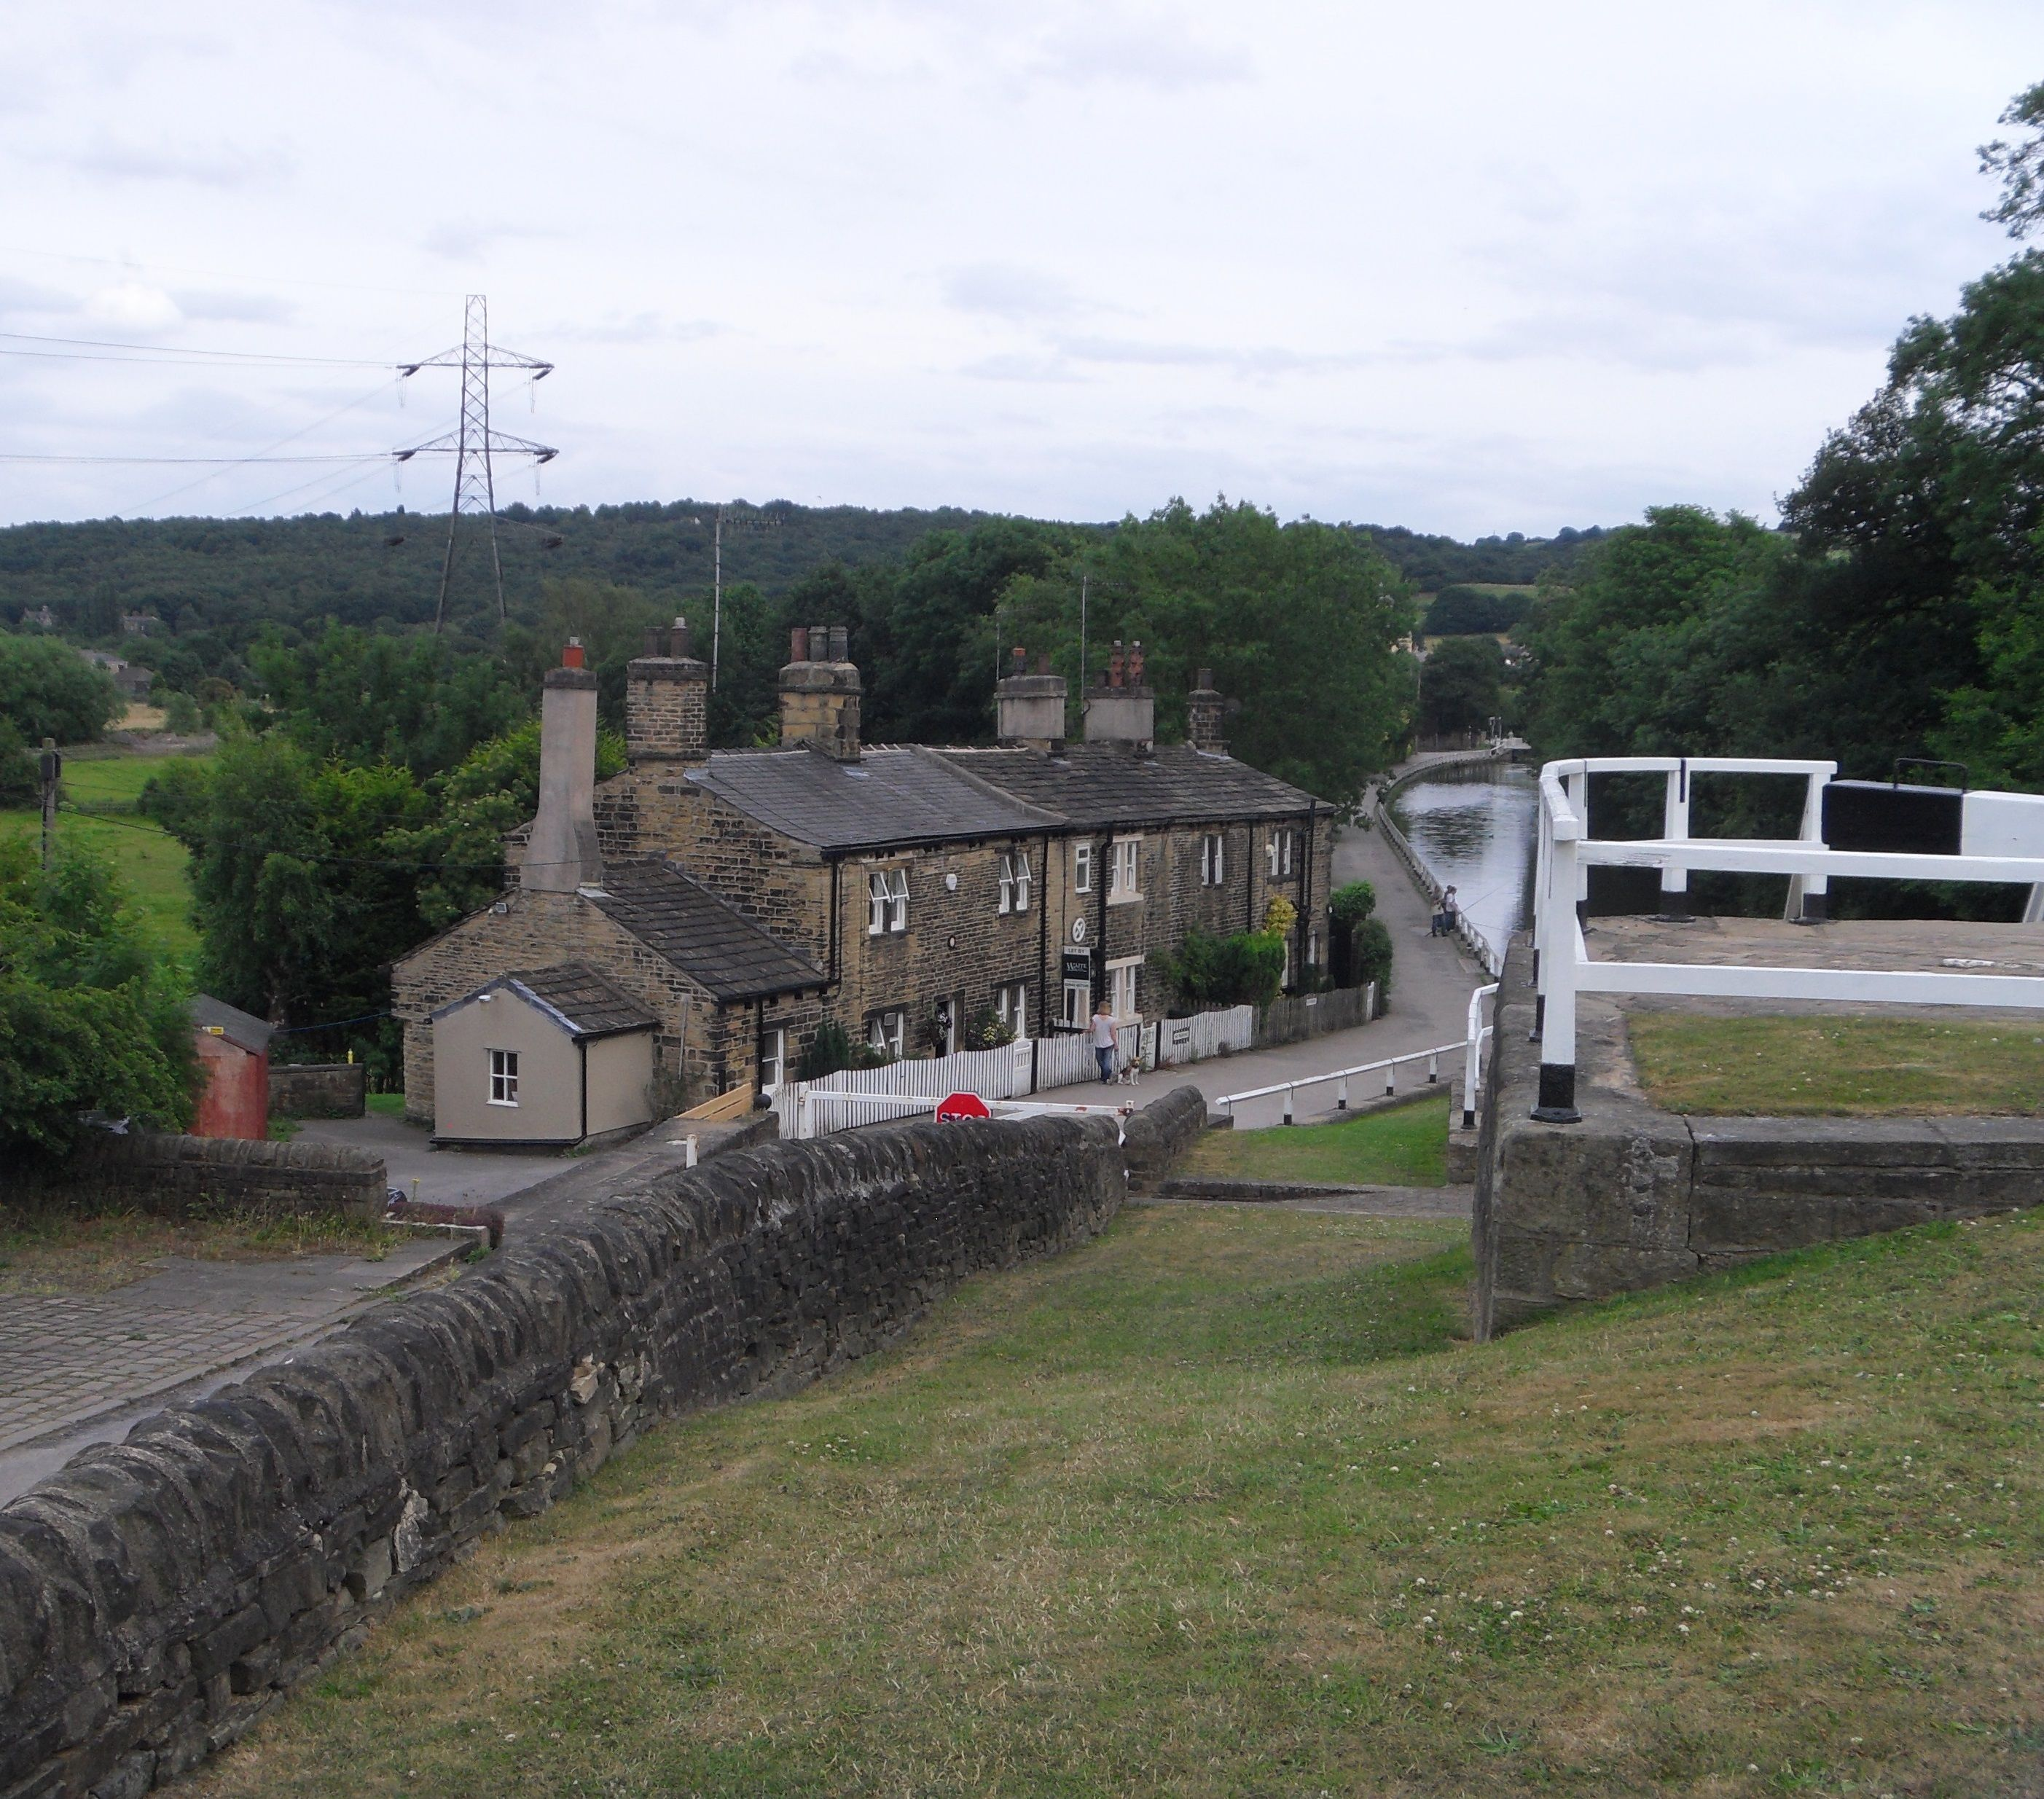 Apperley Bridge